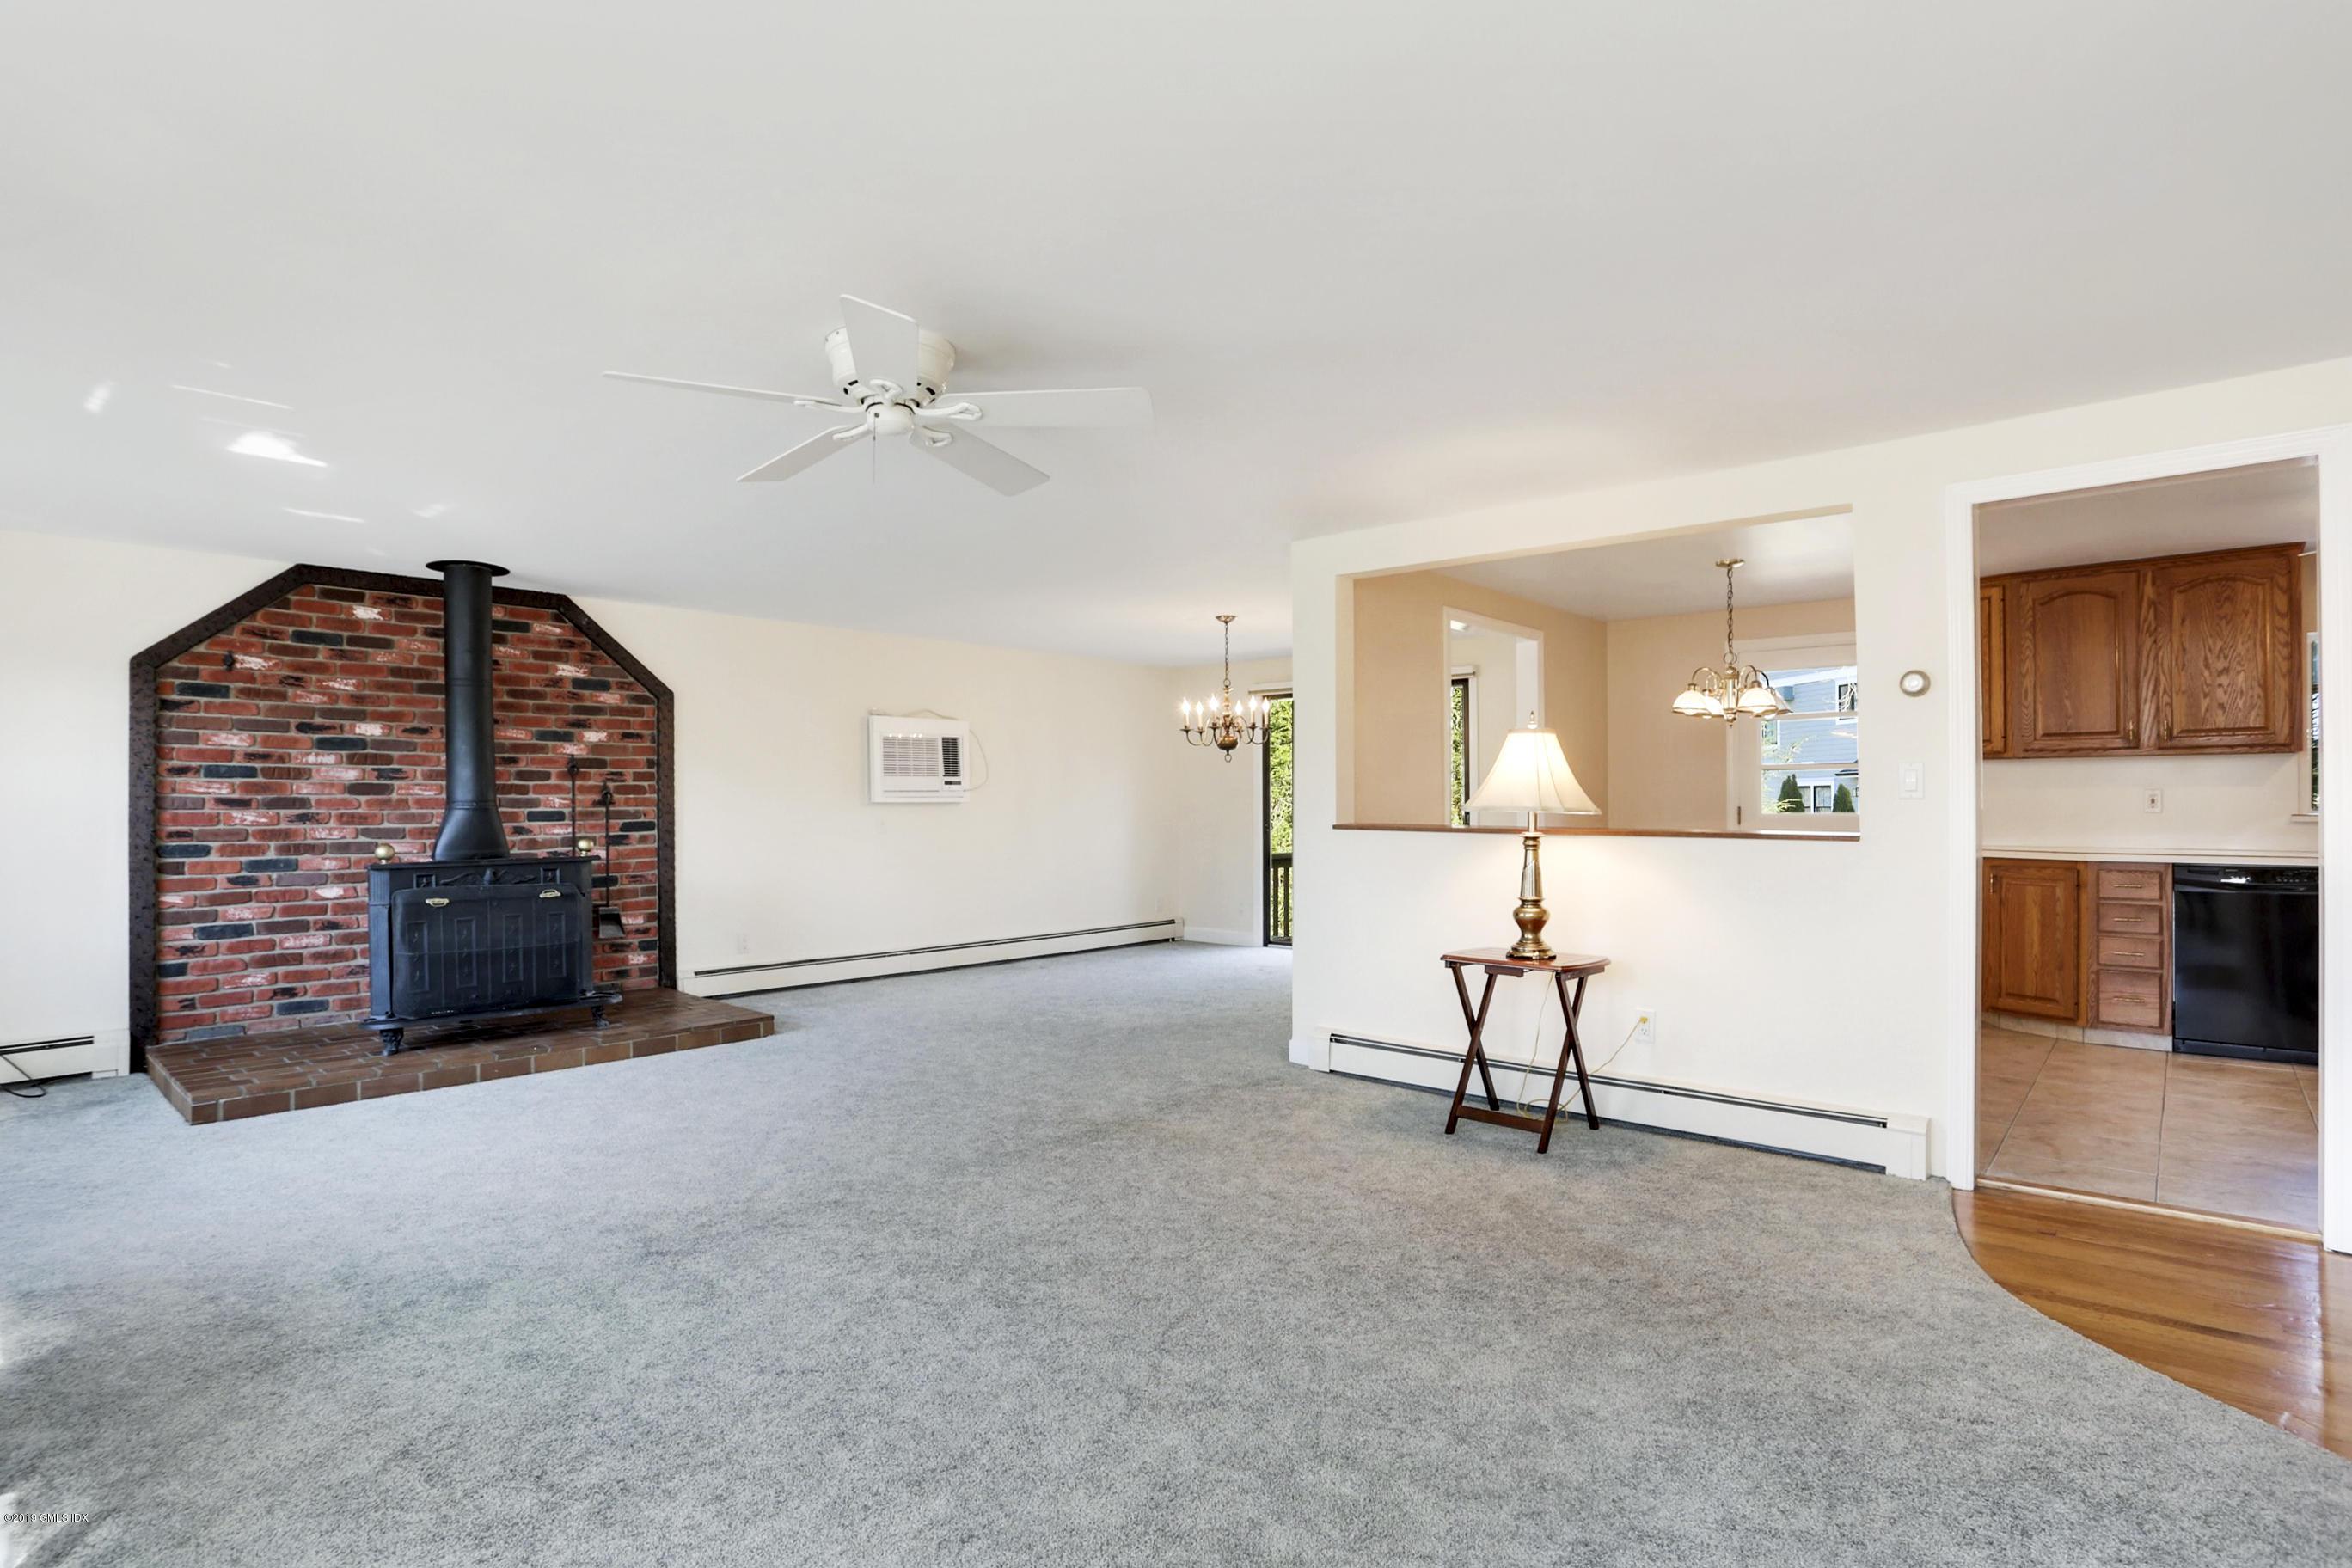 565 River Road,Cos Cob,Connecticut 06807,3 Bedrooms Bedrooms,1 BathroomBathrooms,Single family,River,105411